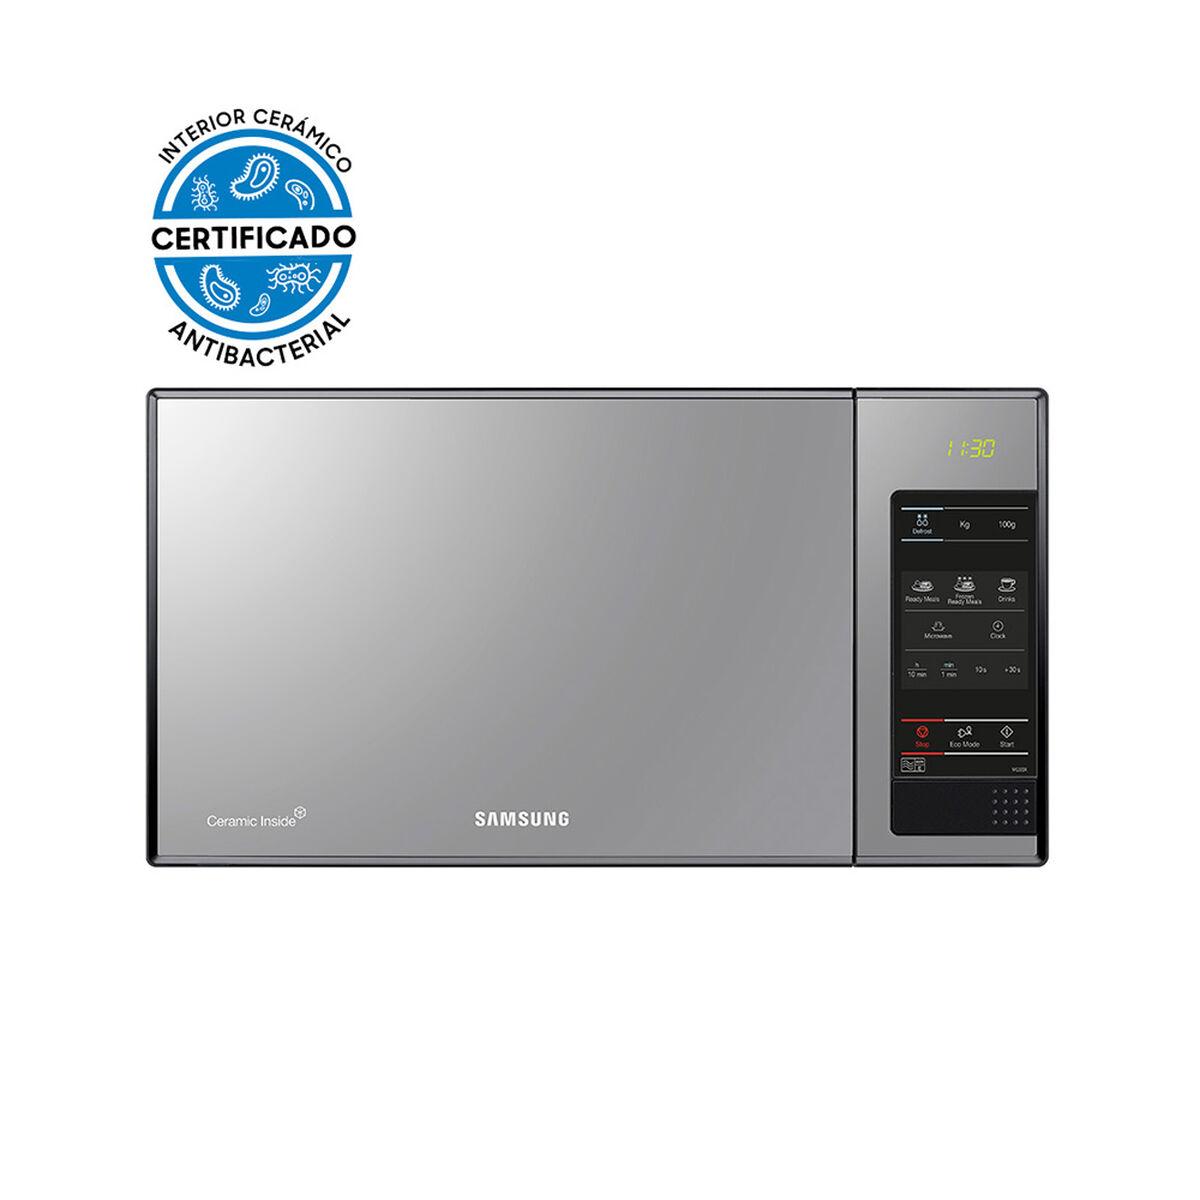 Microondas Samsung ME83X/XZS 23 lt